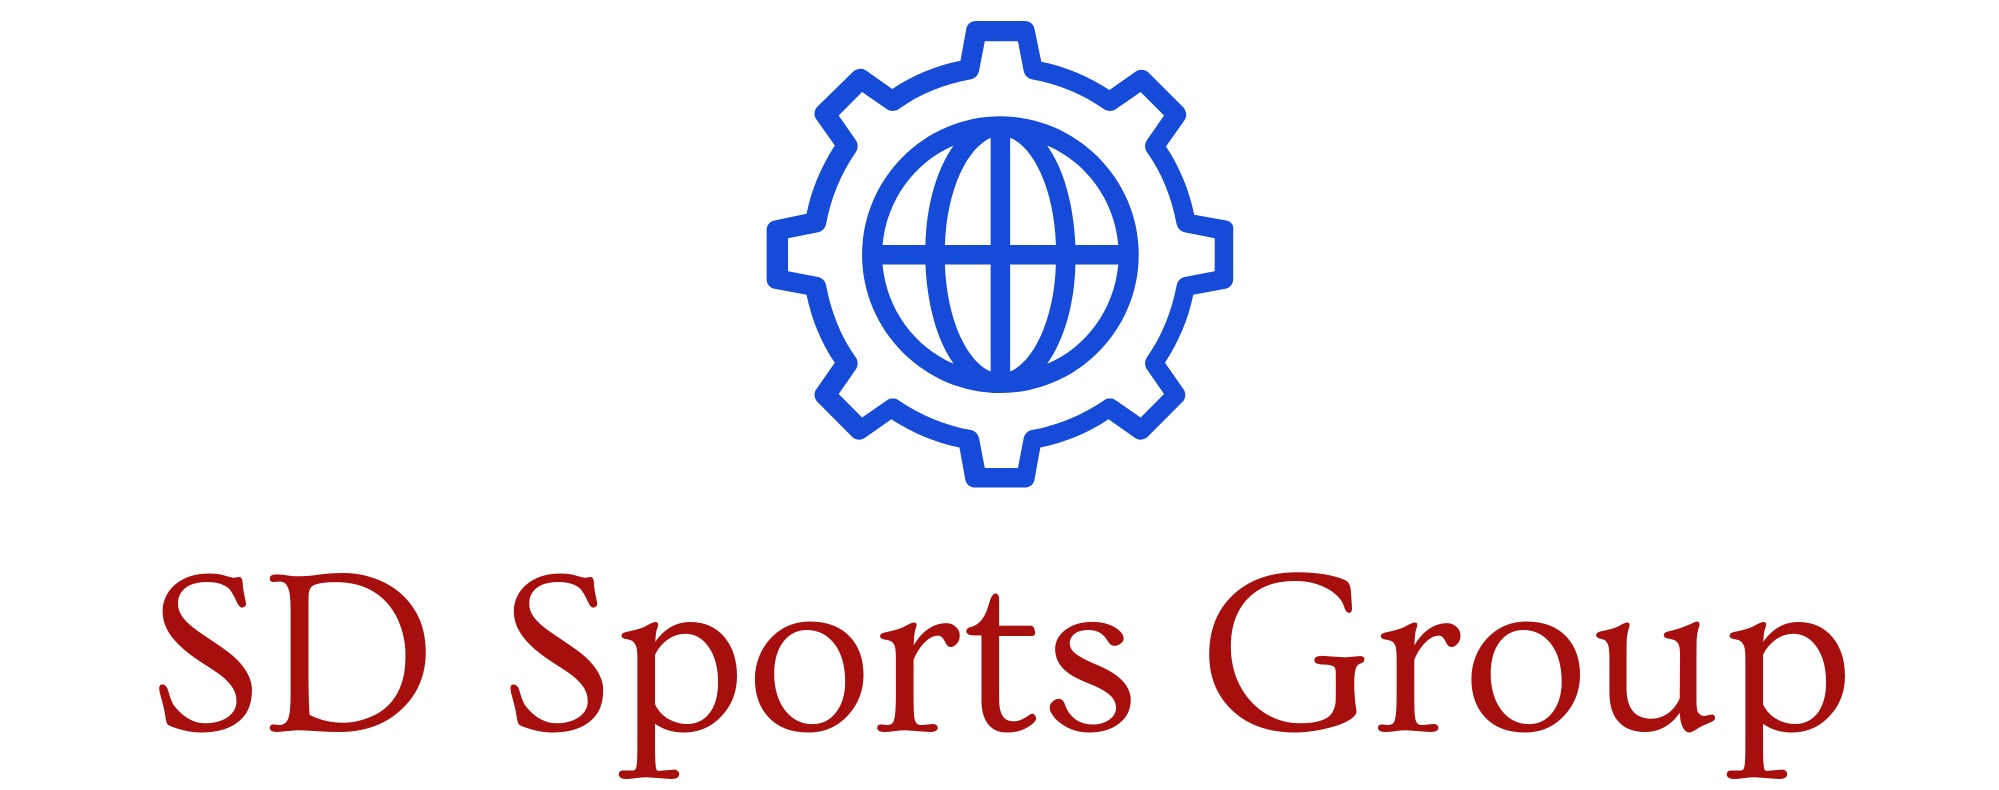 SD+Sports+Group-logo.jpg